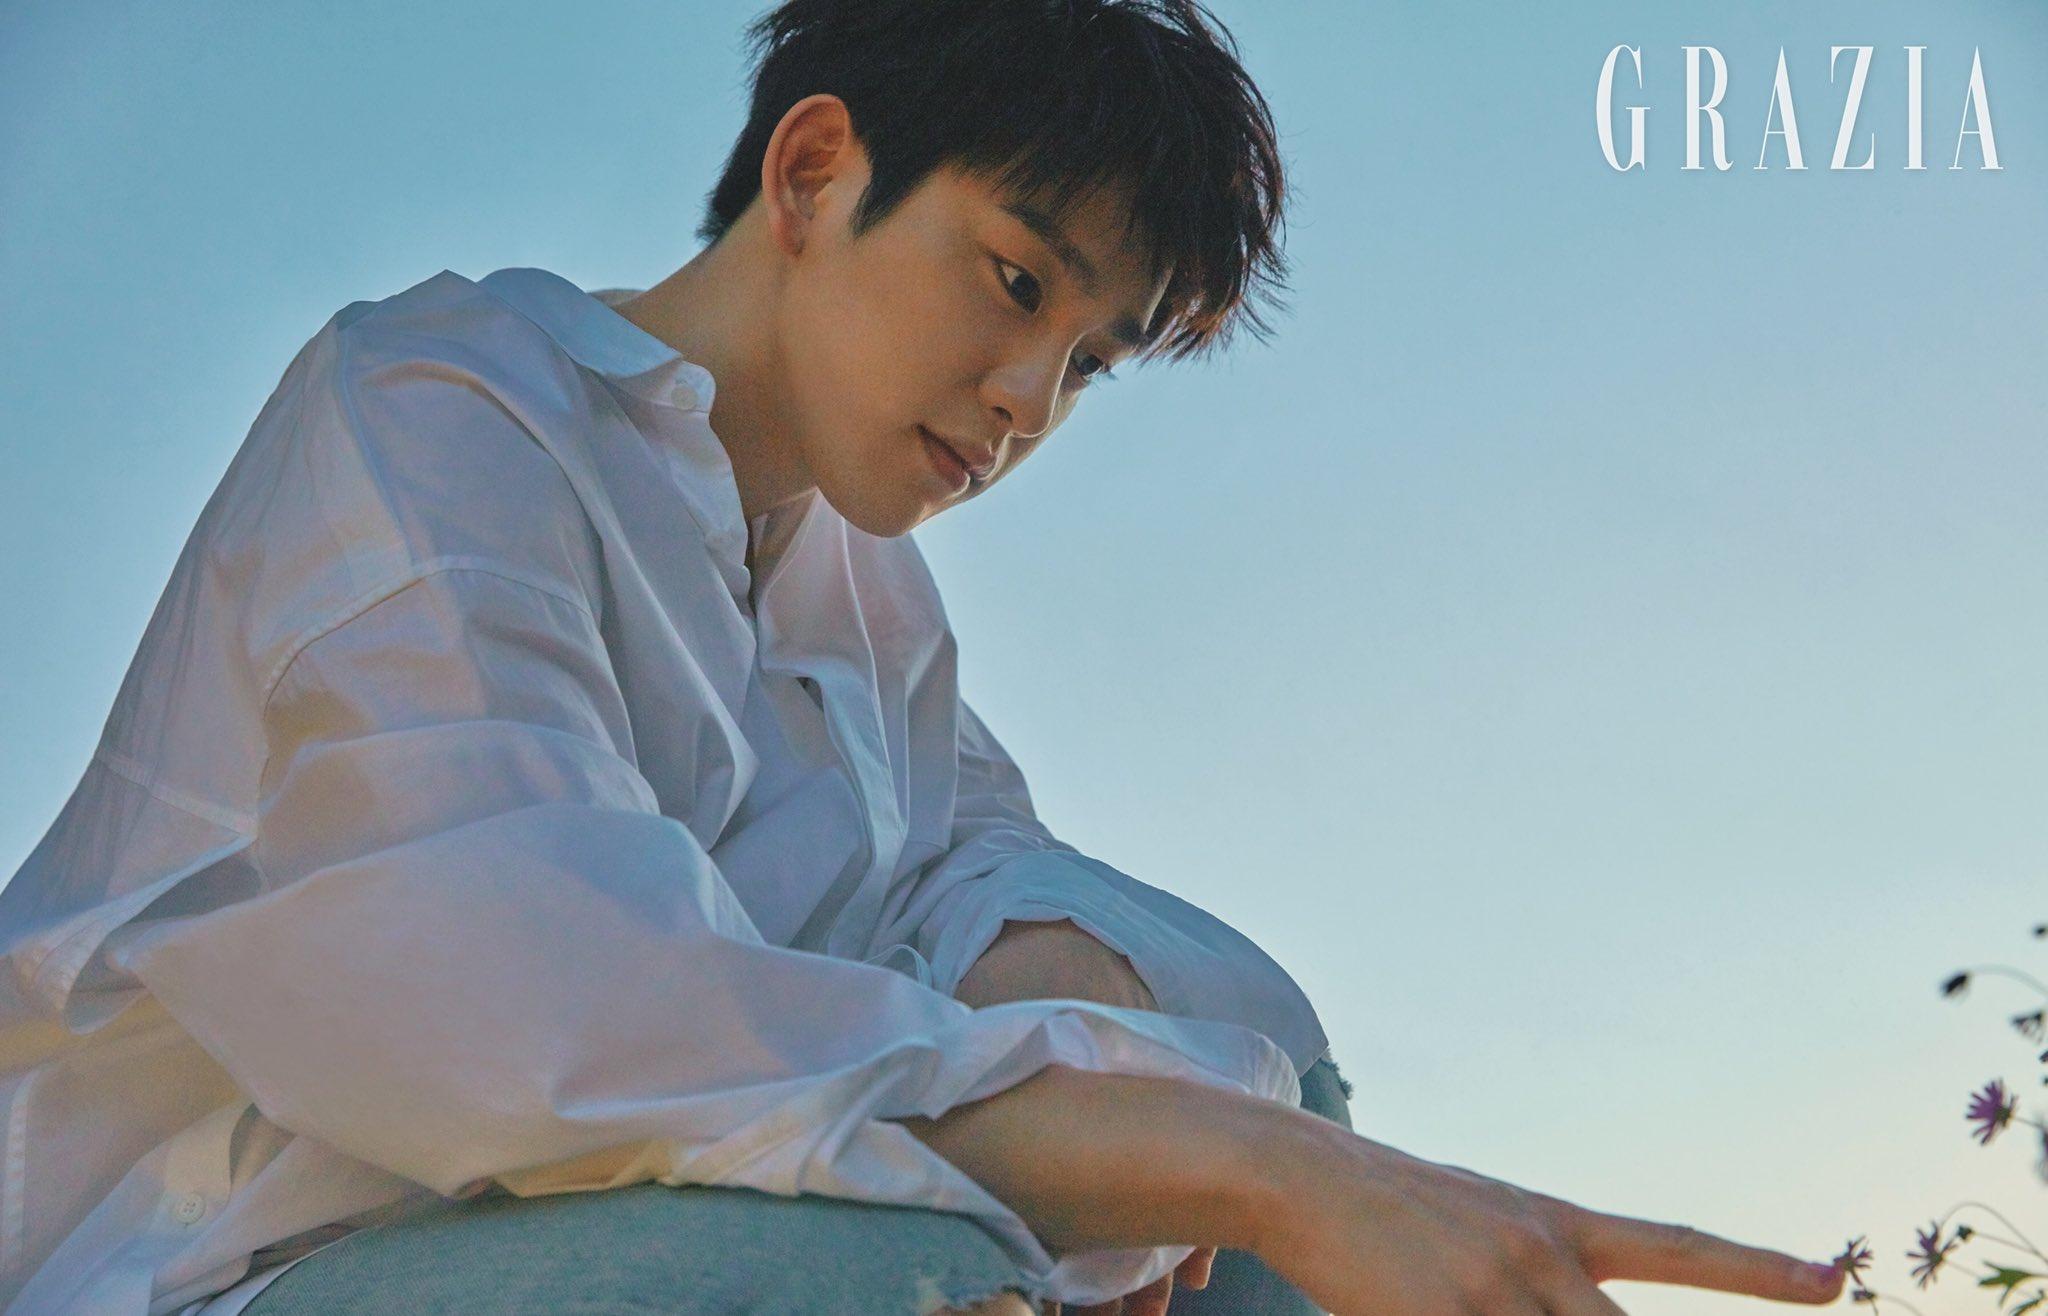 Jinyoung X Grazia Korea July, 2018   #진영 #GOT7 #갓세븐 https://t.co/FehNyf0bFq